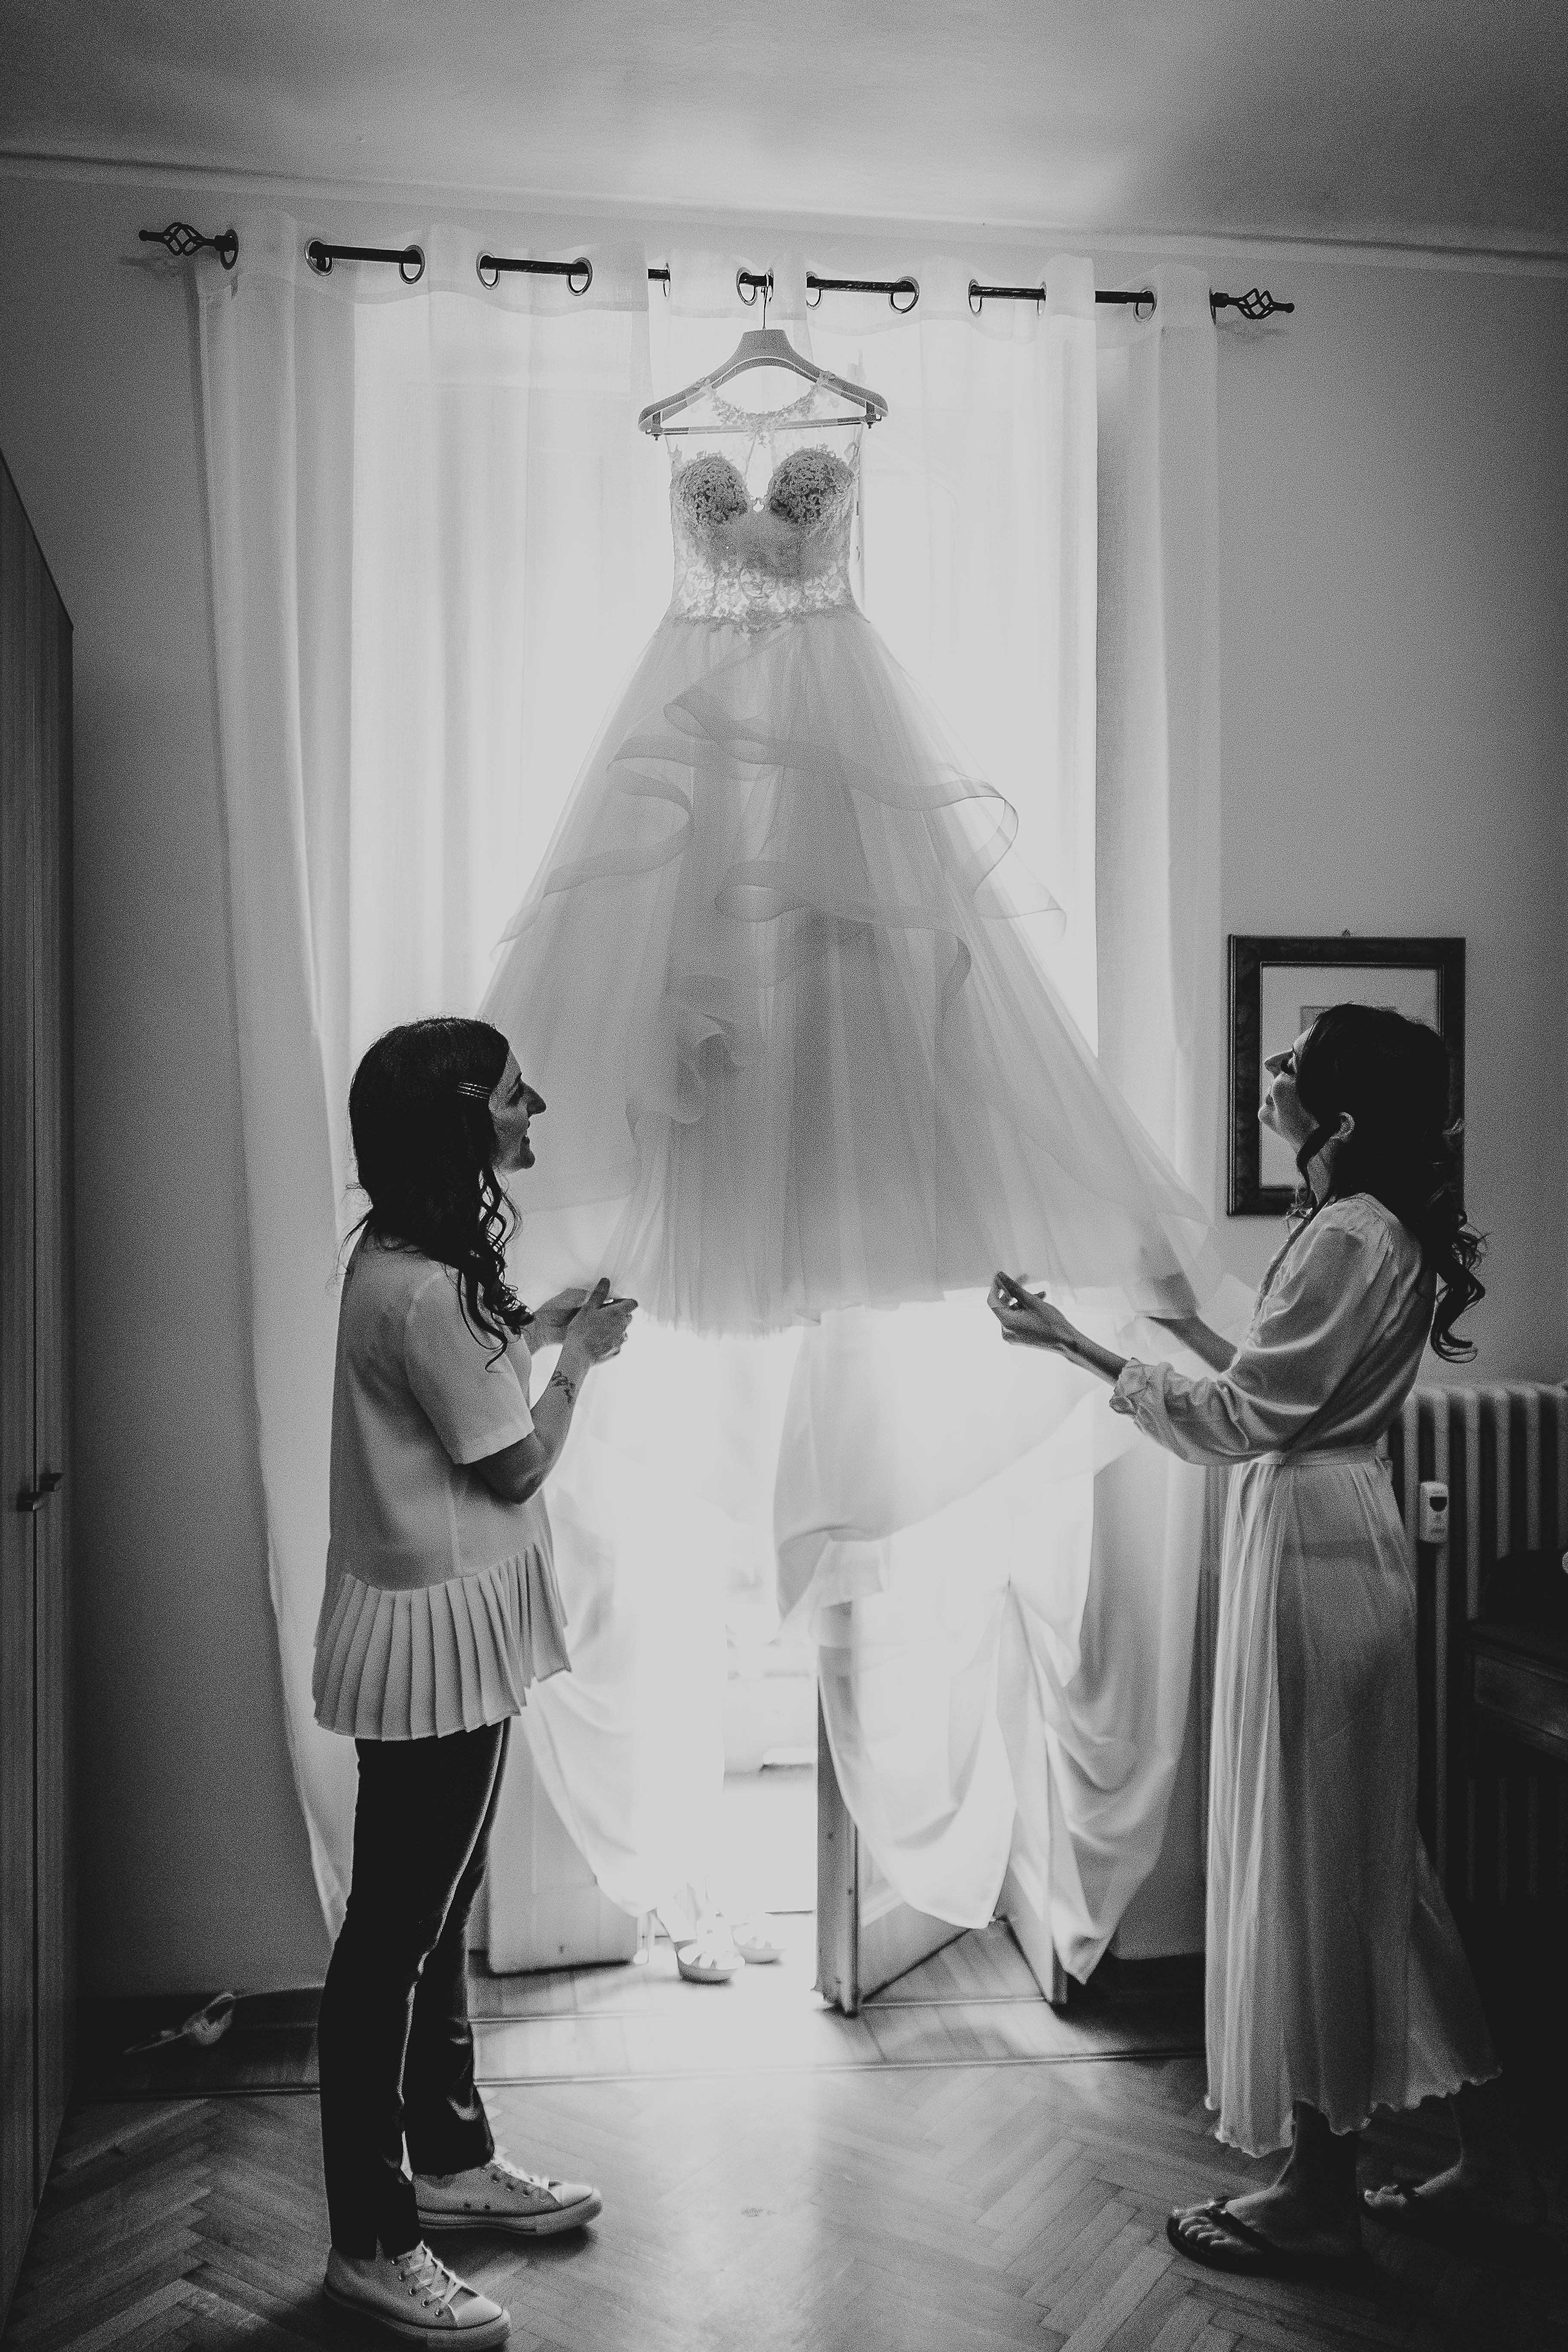 matrimonio rimandato Covid-19